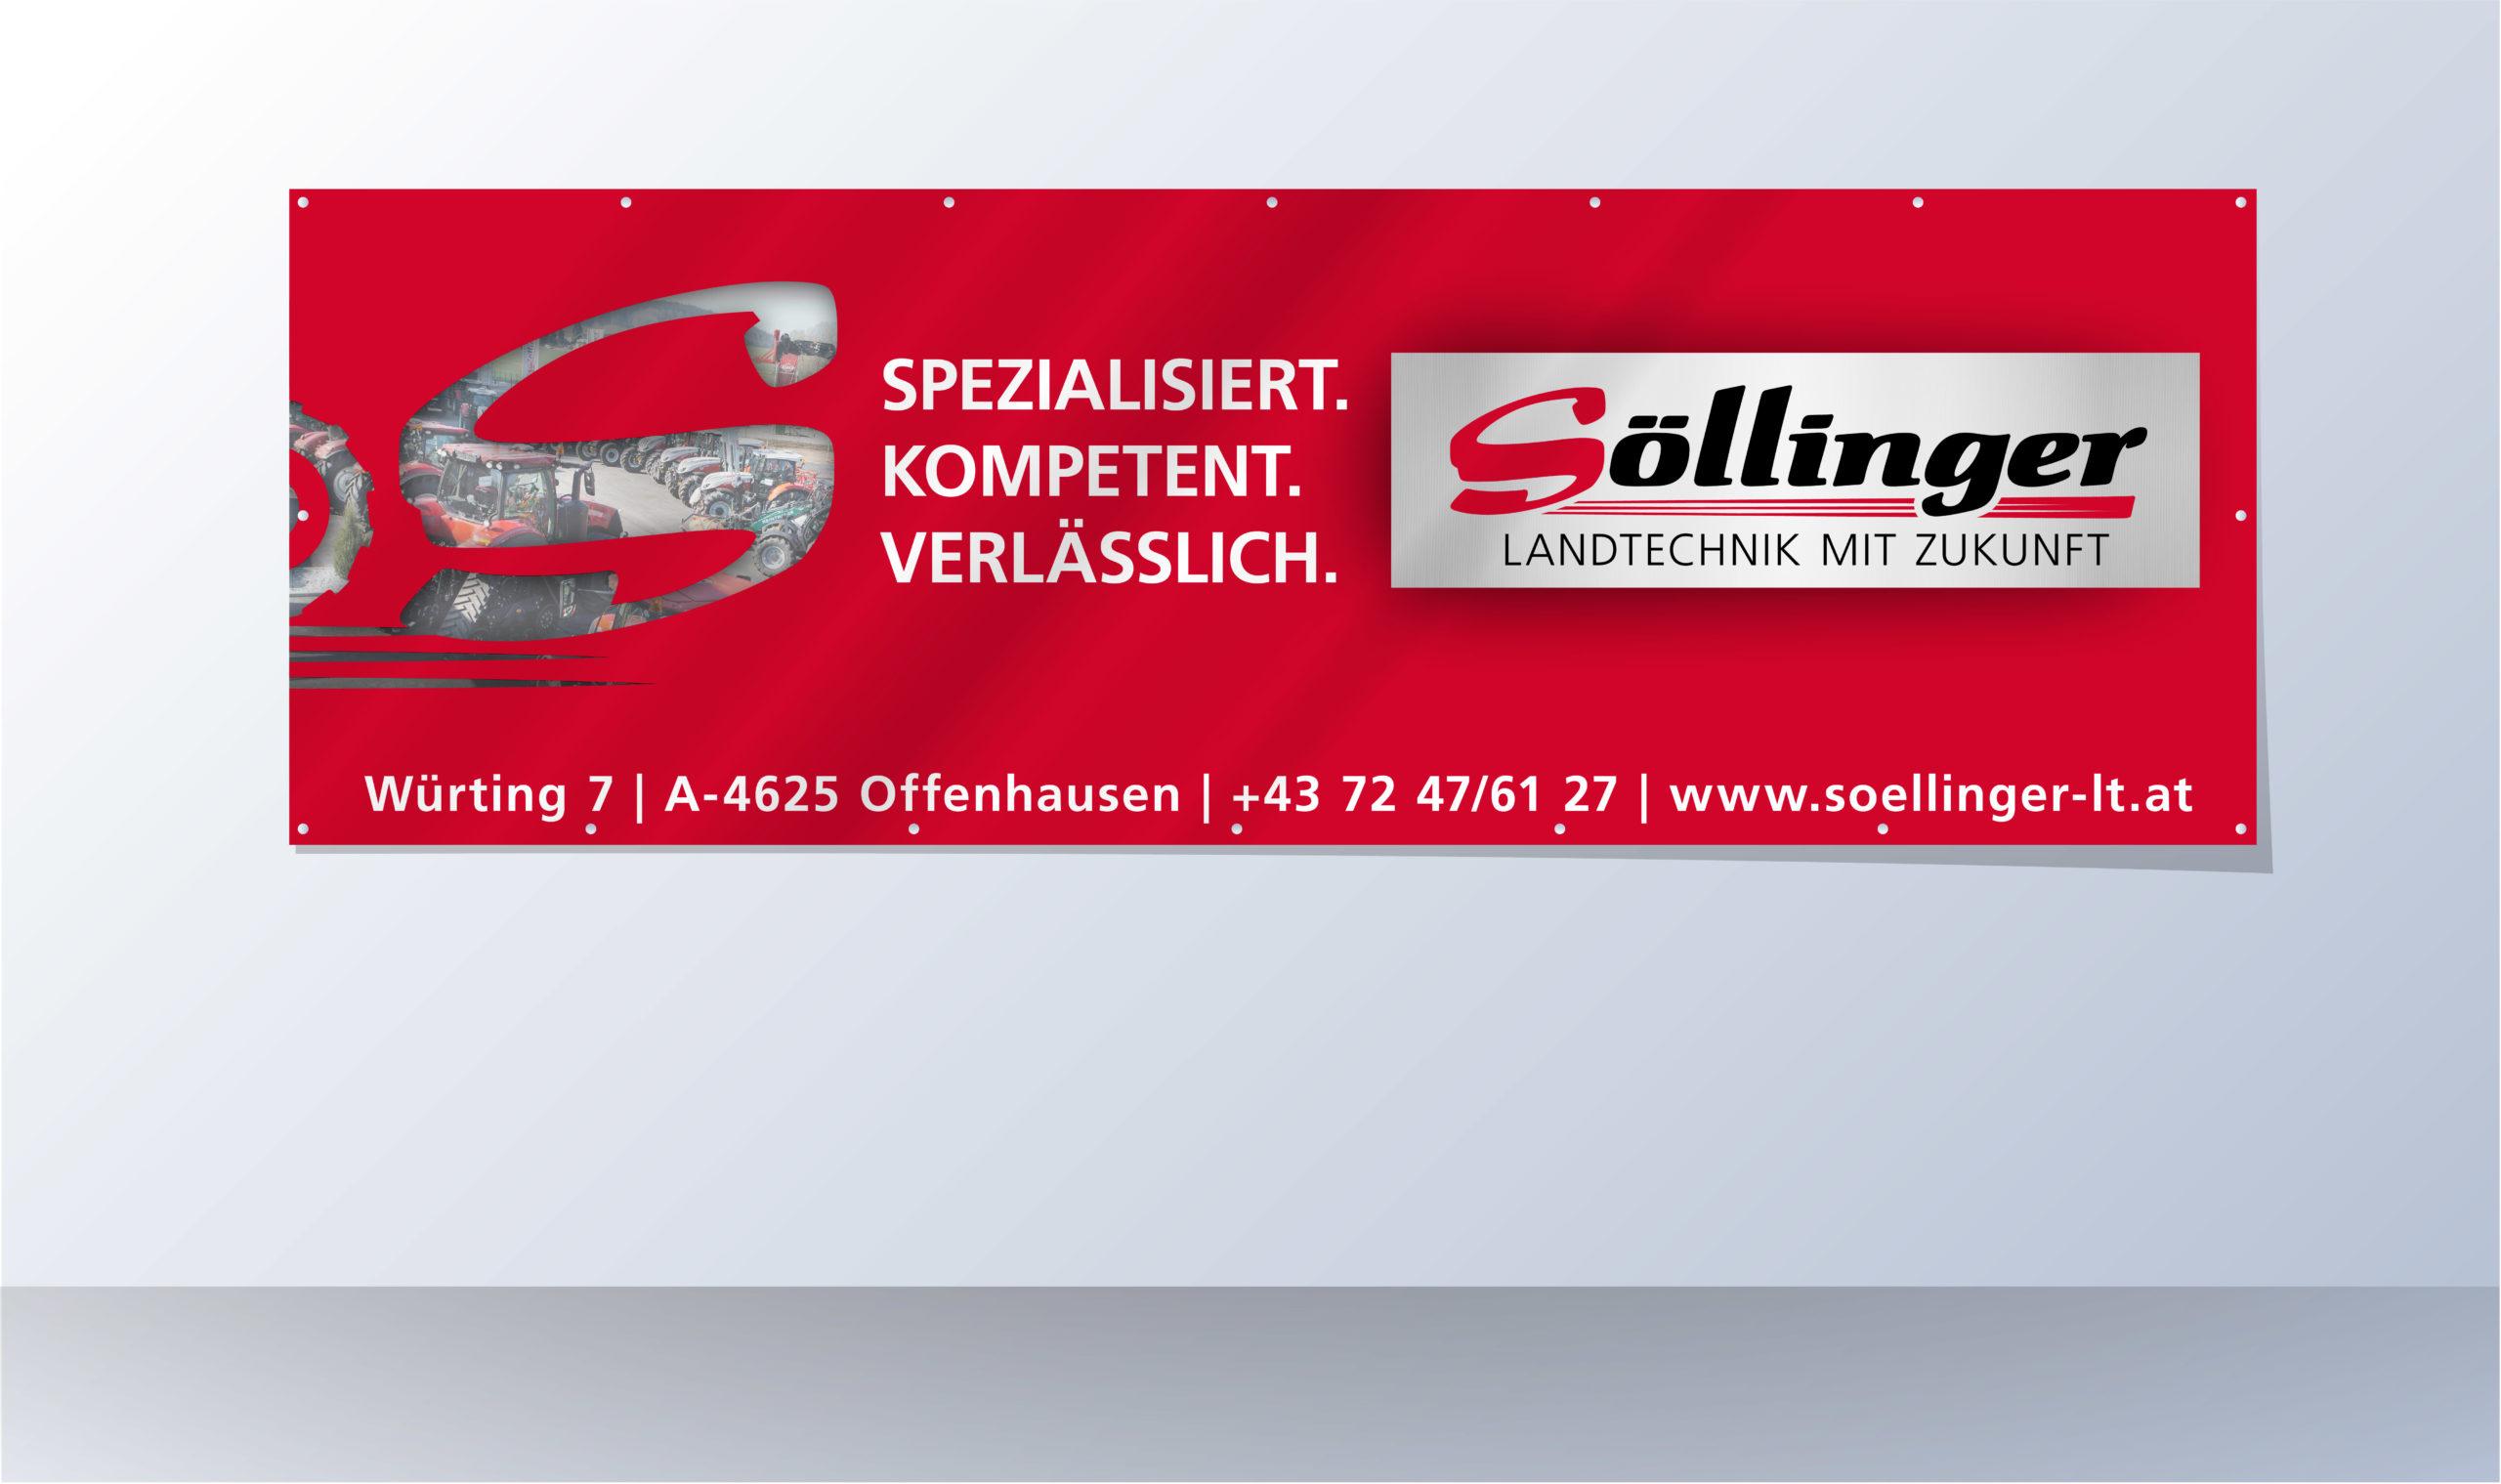 söllinger-landtechnik-image-6